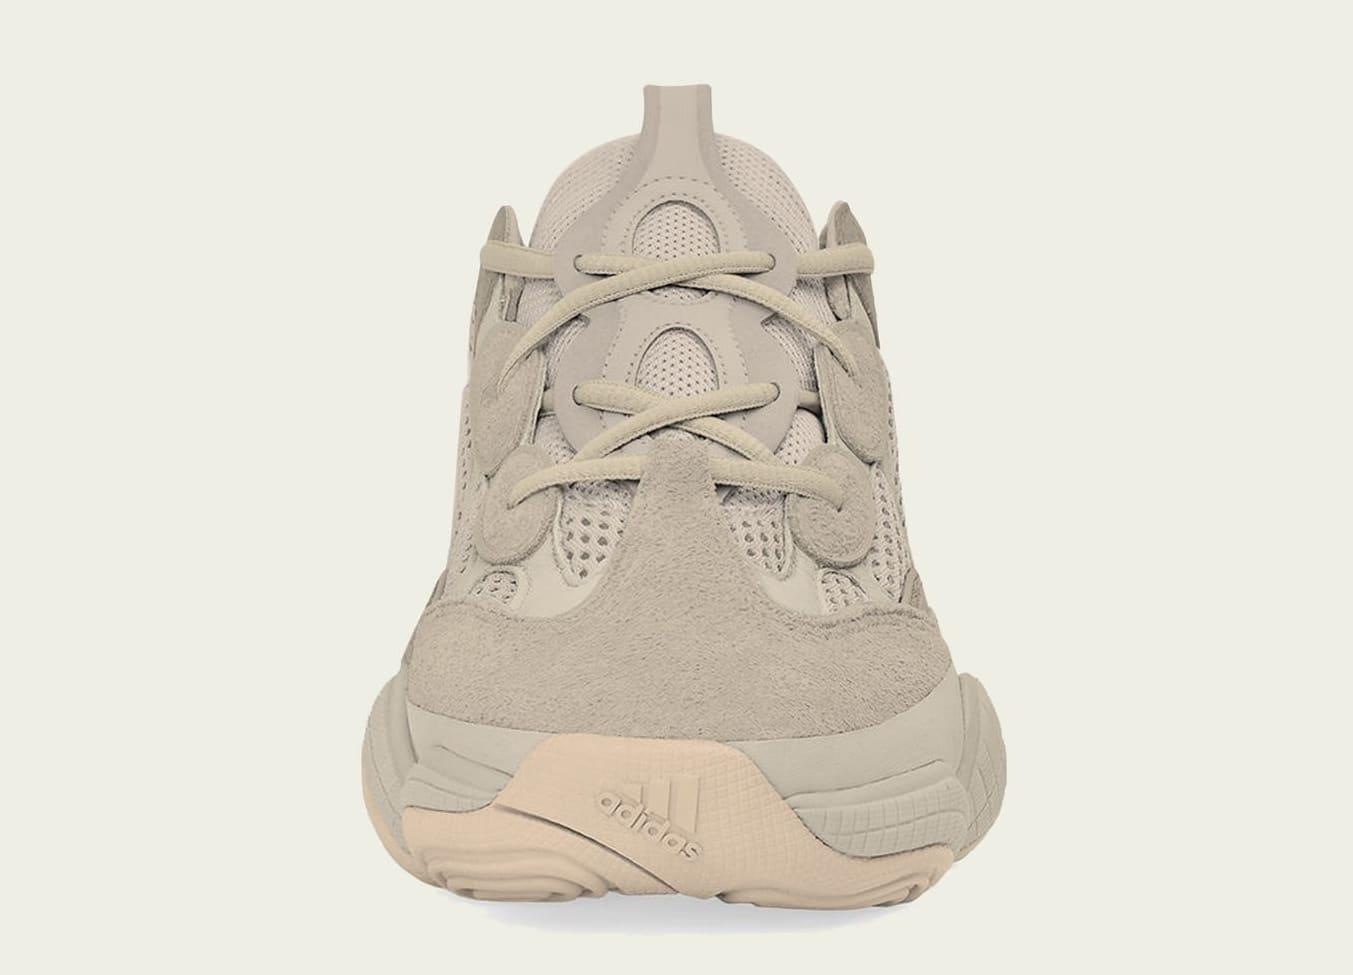 adidas-yeezy-500-stone-mock-up